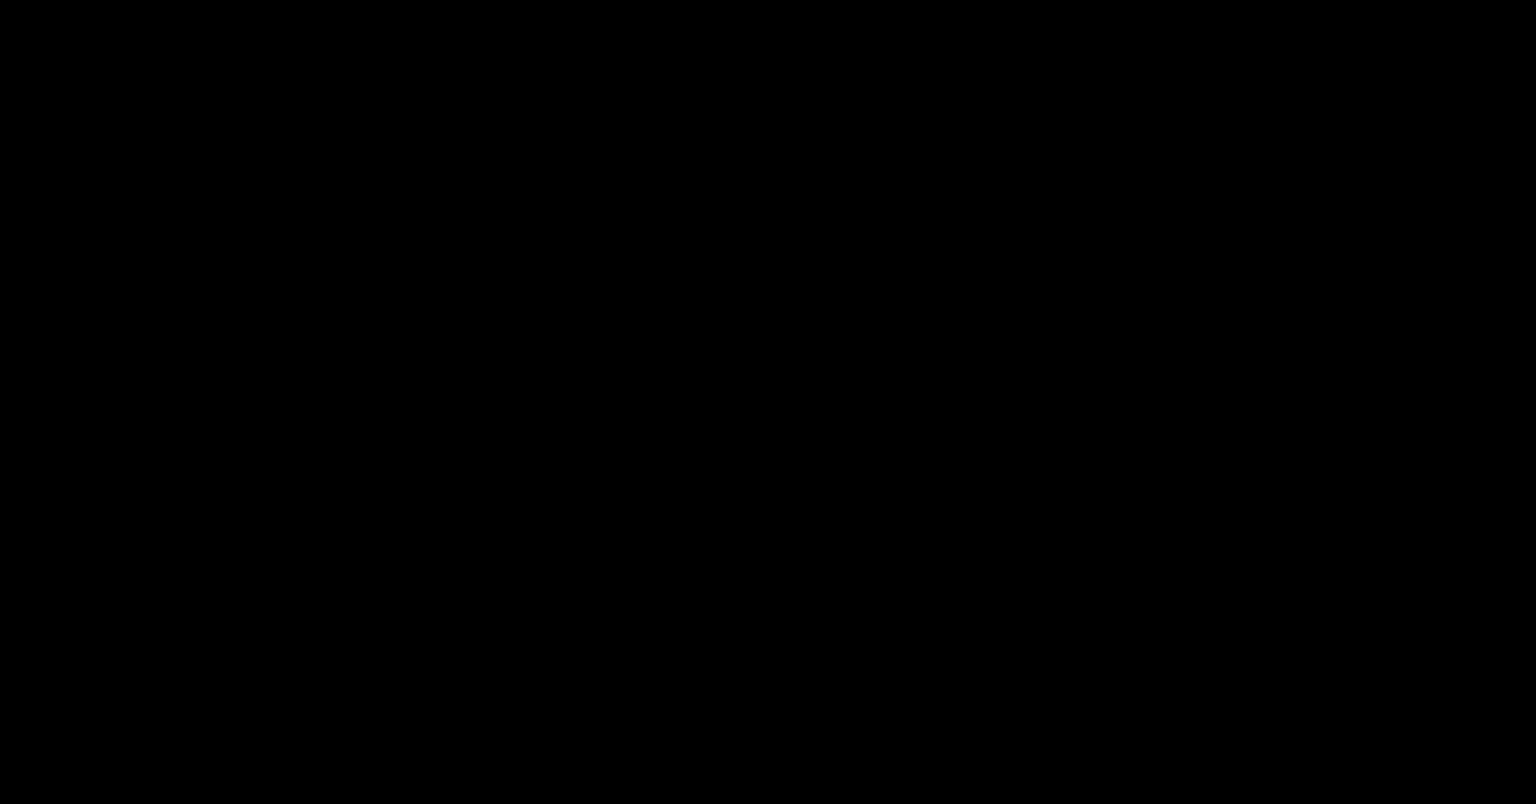 2-[(5-(4-(Diphenylamino)phenyl)thiophen-2-yl)methylene]malononitrile